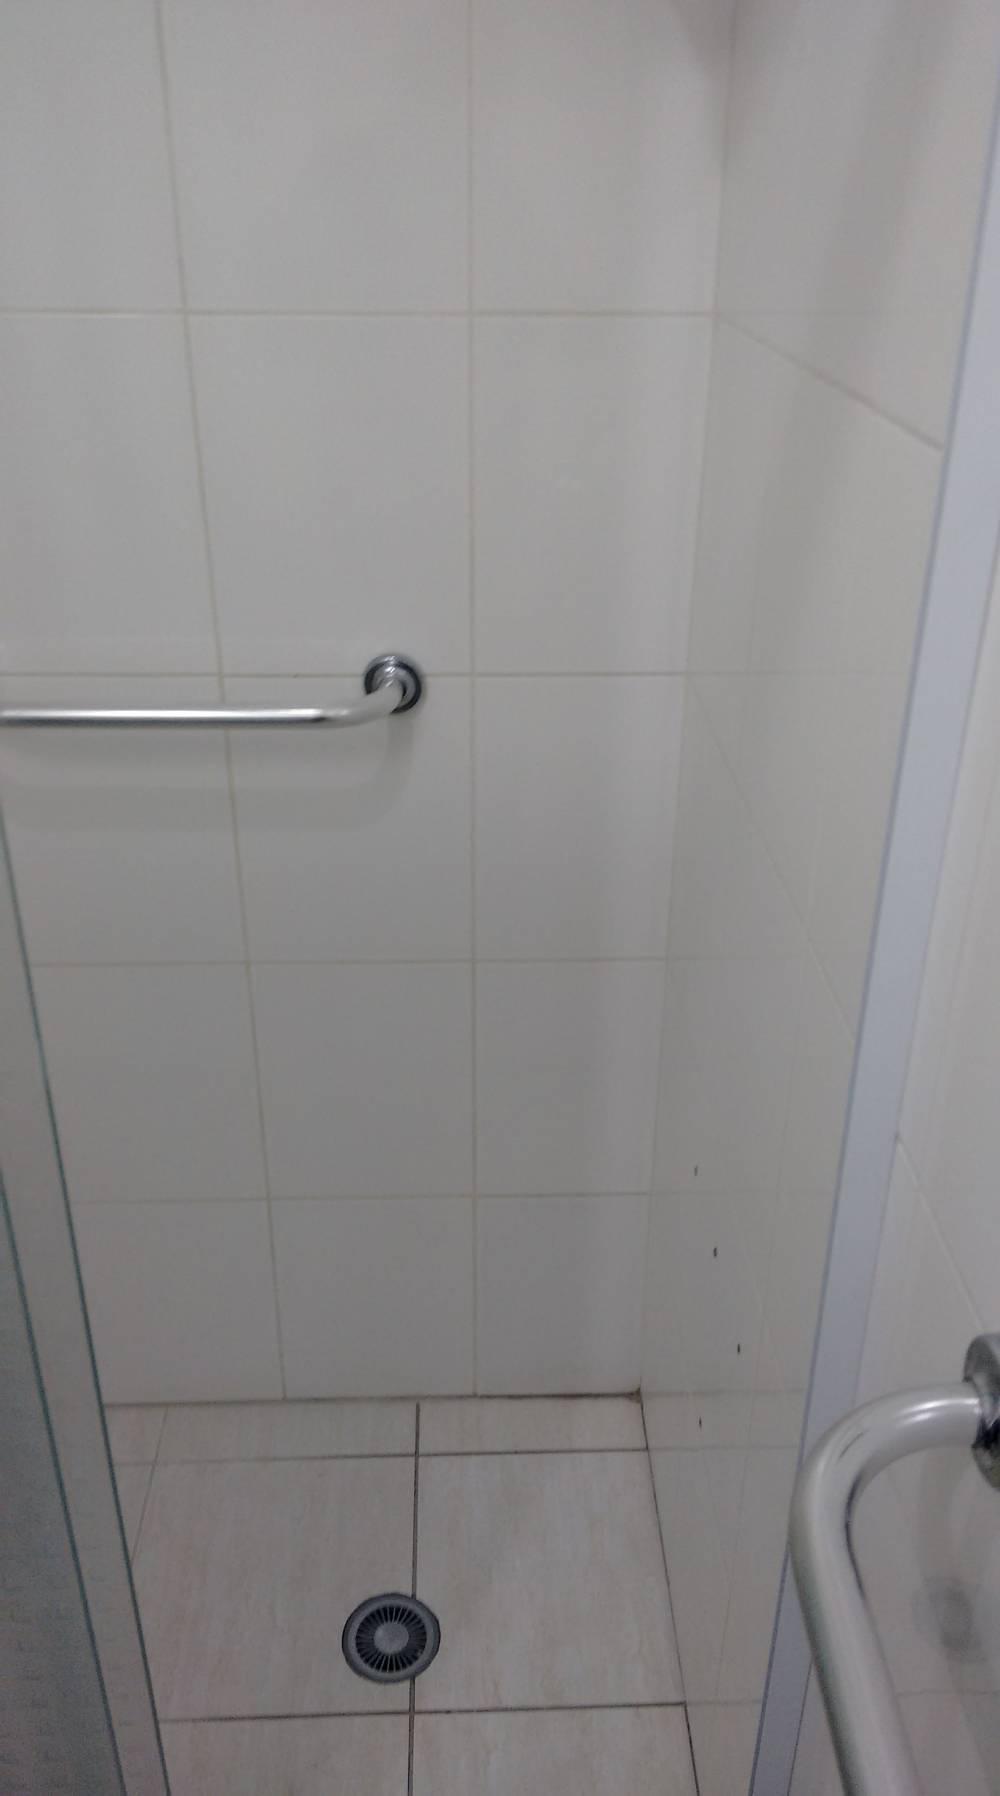 Serviço de Pequenos Reparos Residenciais na Vila Metalúrgica - Empresa de Reparos Residenciais